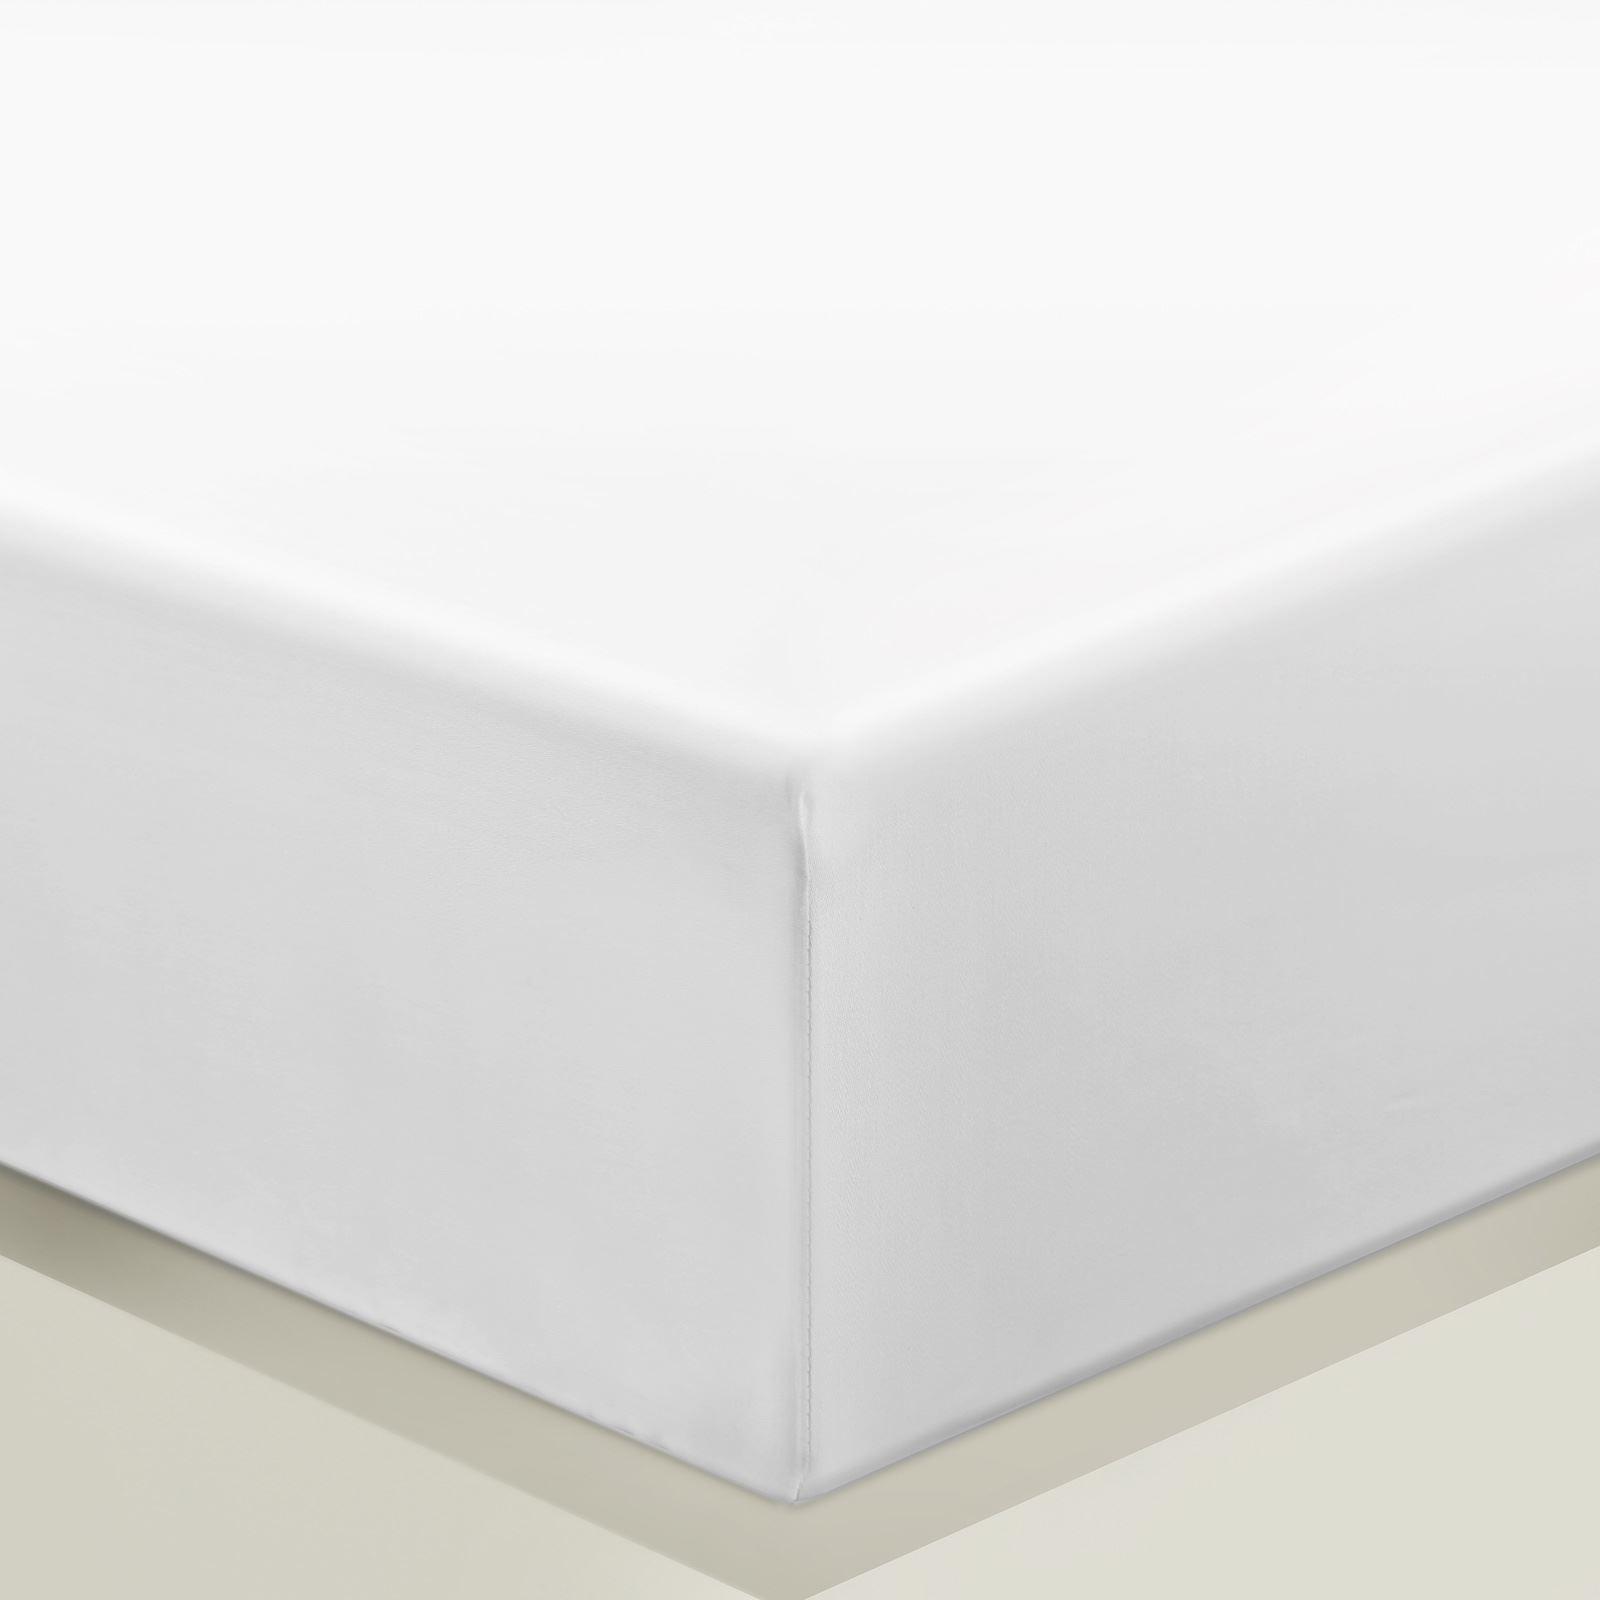 100-algodon-egipcio-de-lujo-a-rayas-Satin-funda-de-edredon-cabido-hoja-plana-Cenefa miniatura 13